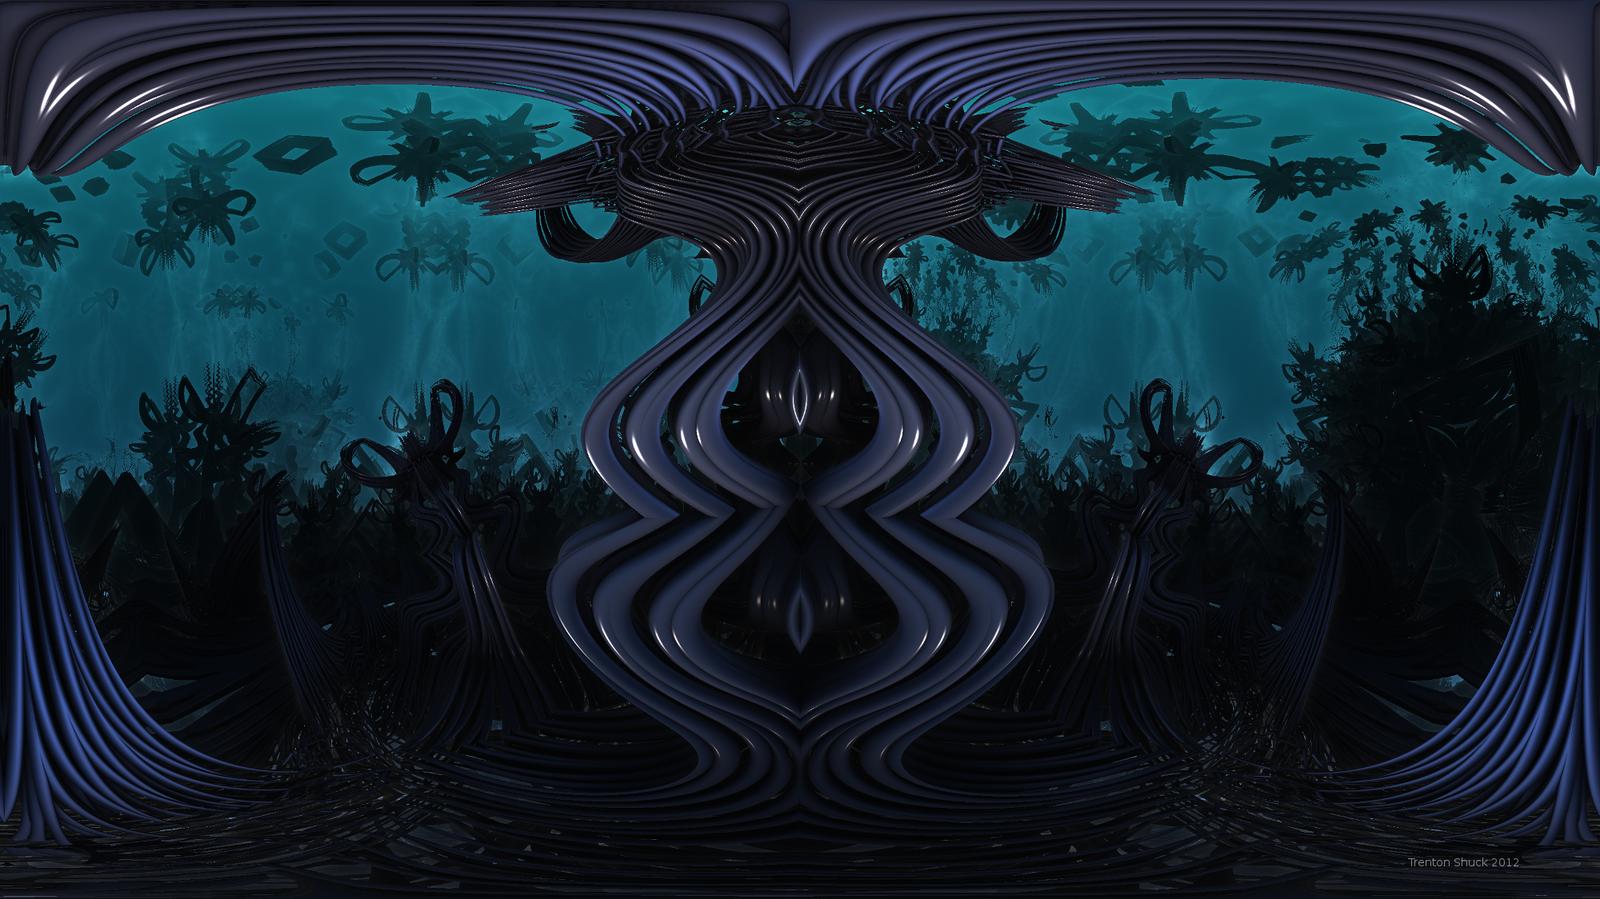 Aqua Totem by Trenton-Shuck